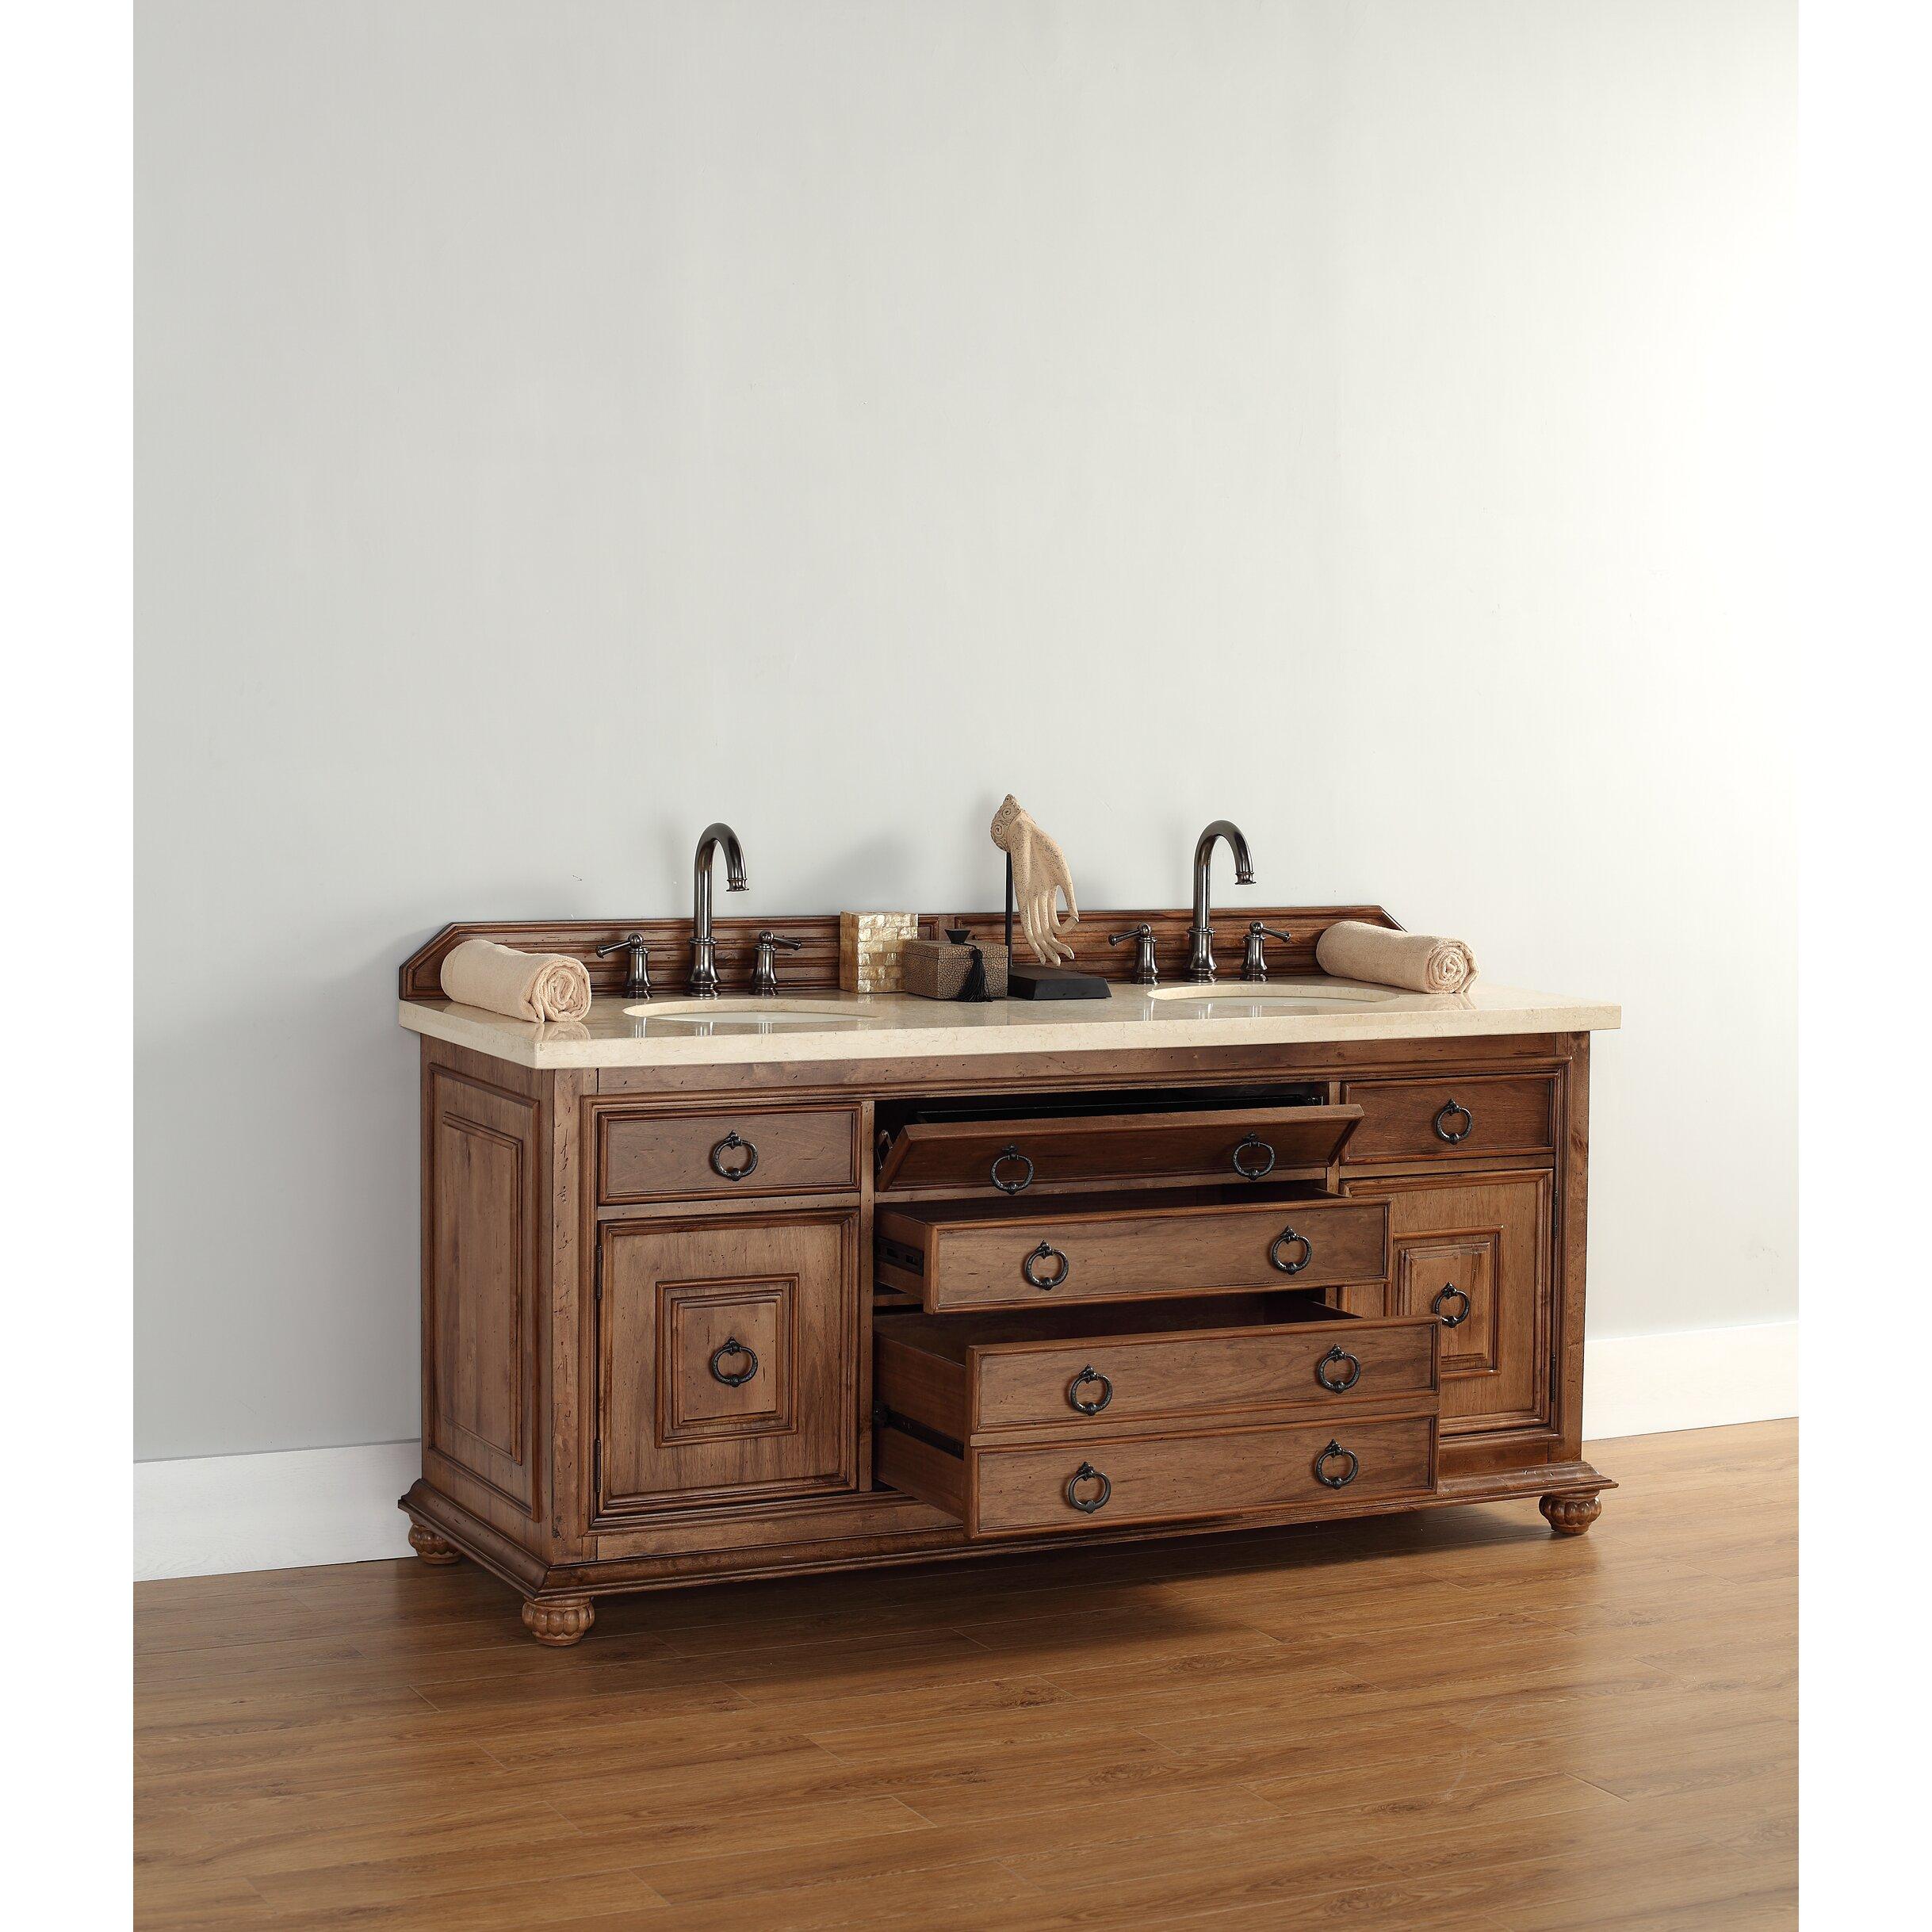 James Martin Furniture Mykonos 72 Double Bathroom Vanity Set Reviews Wayfair